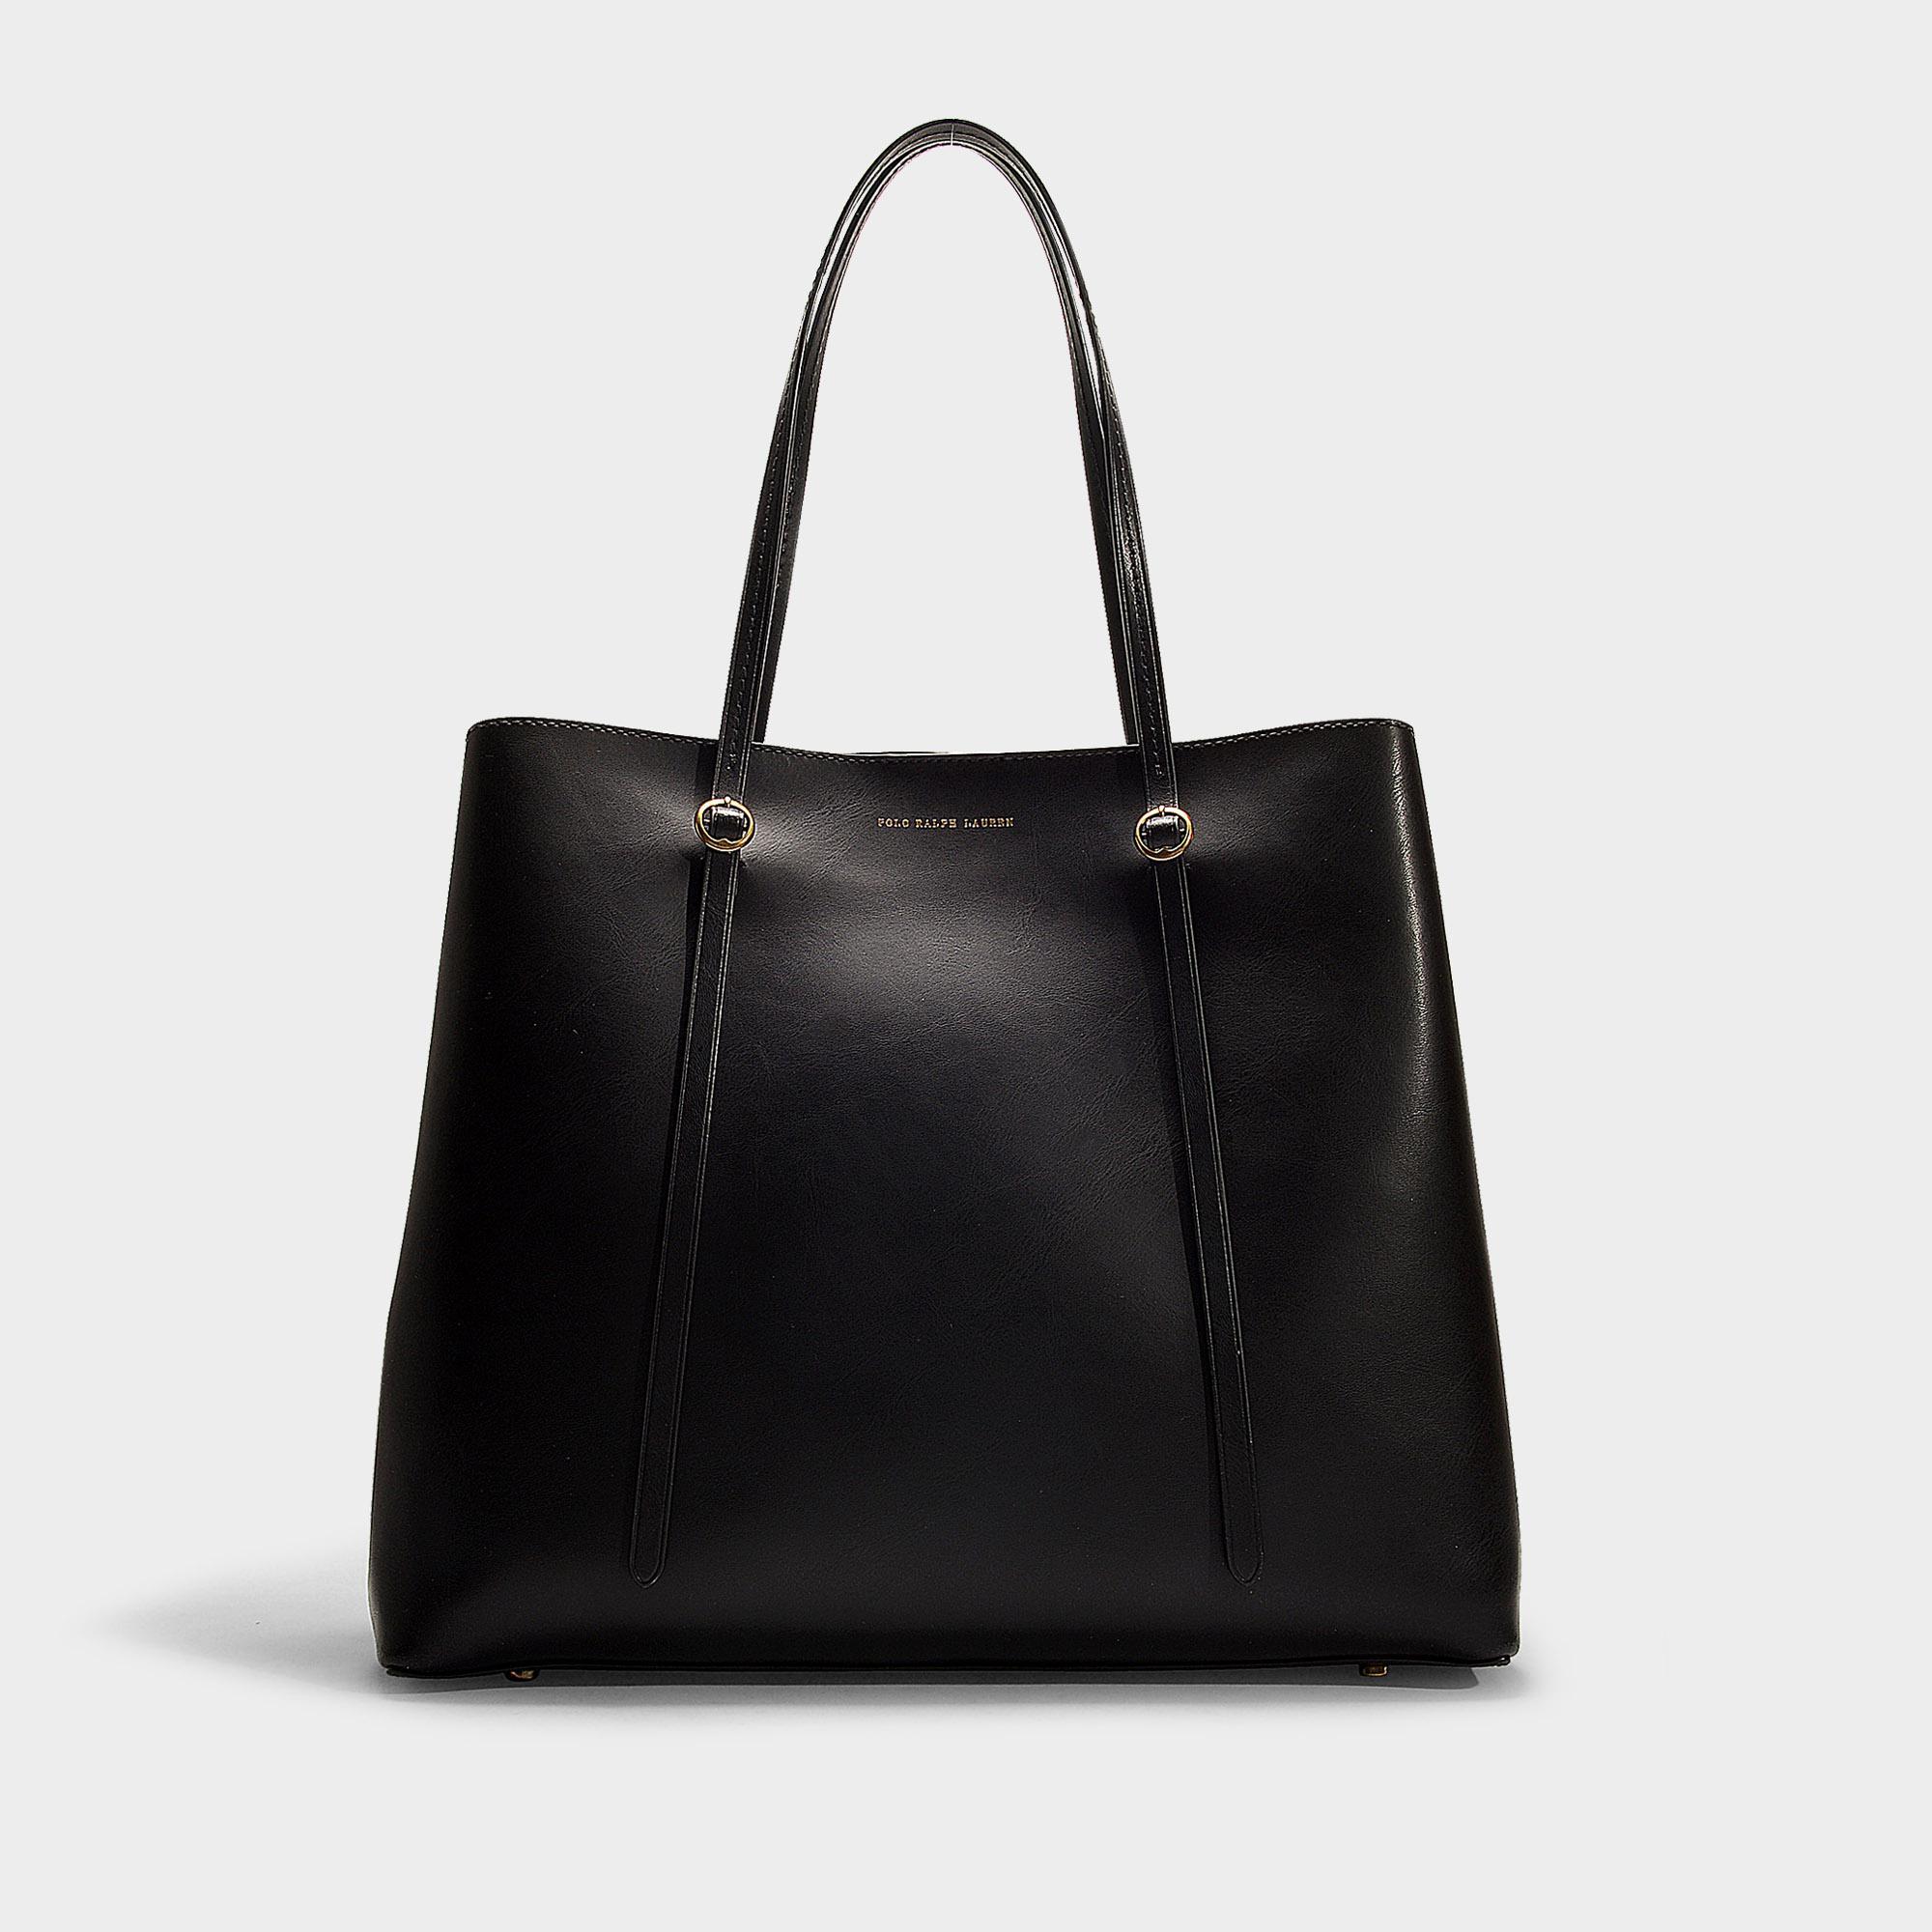 47bf211b07c2 Polo Ralph Lauren Big Lennox Tote Bag In Black Calfskin in Black ...